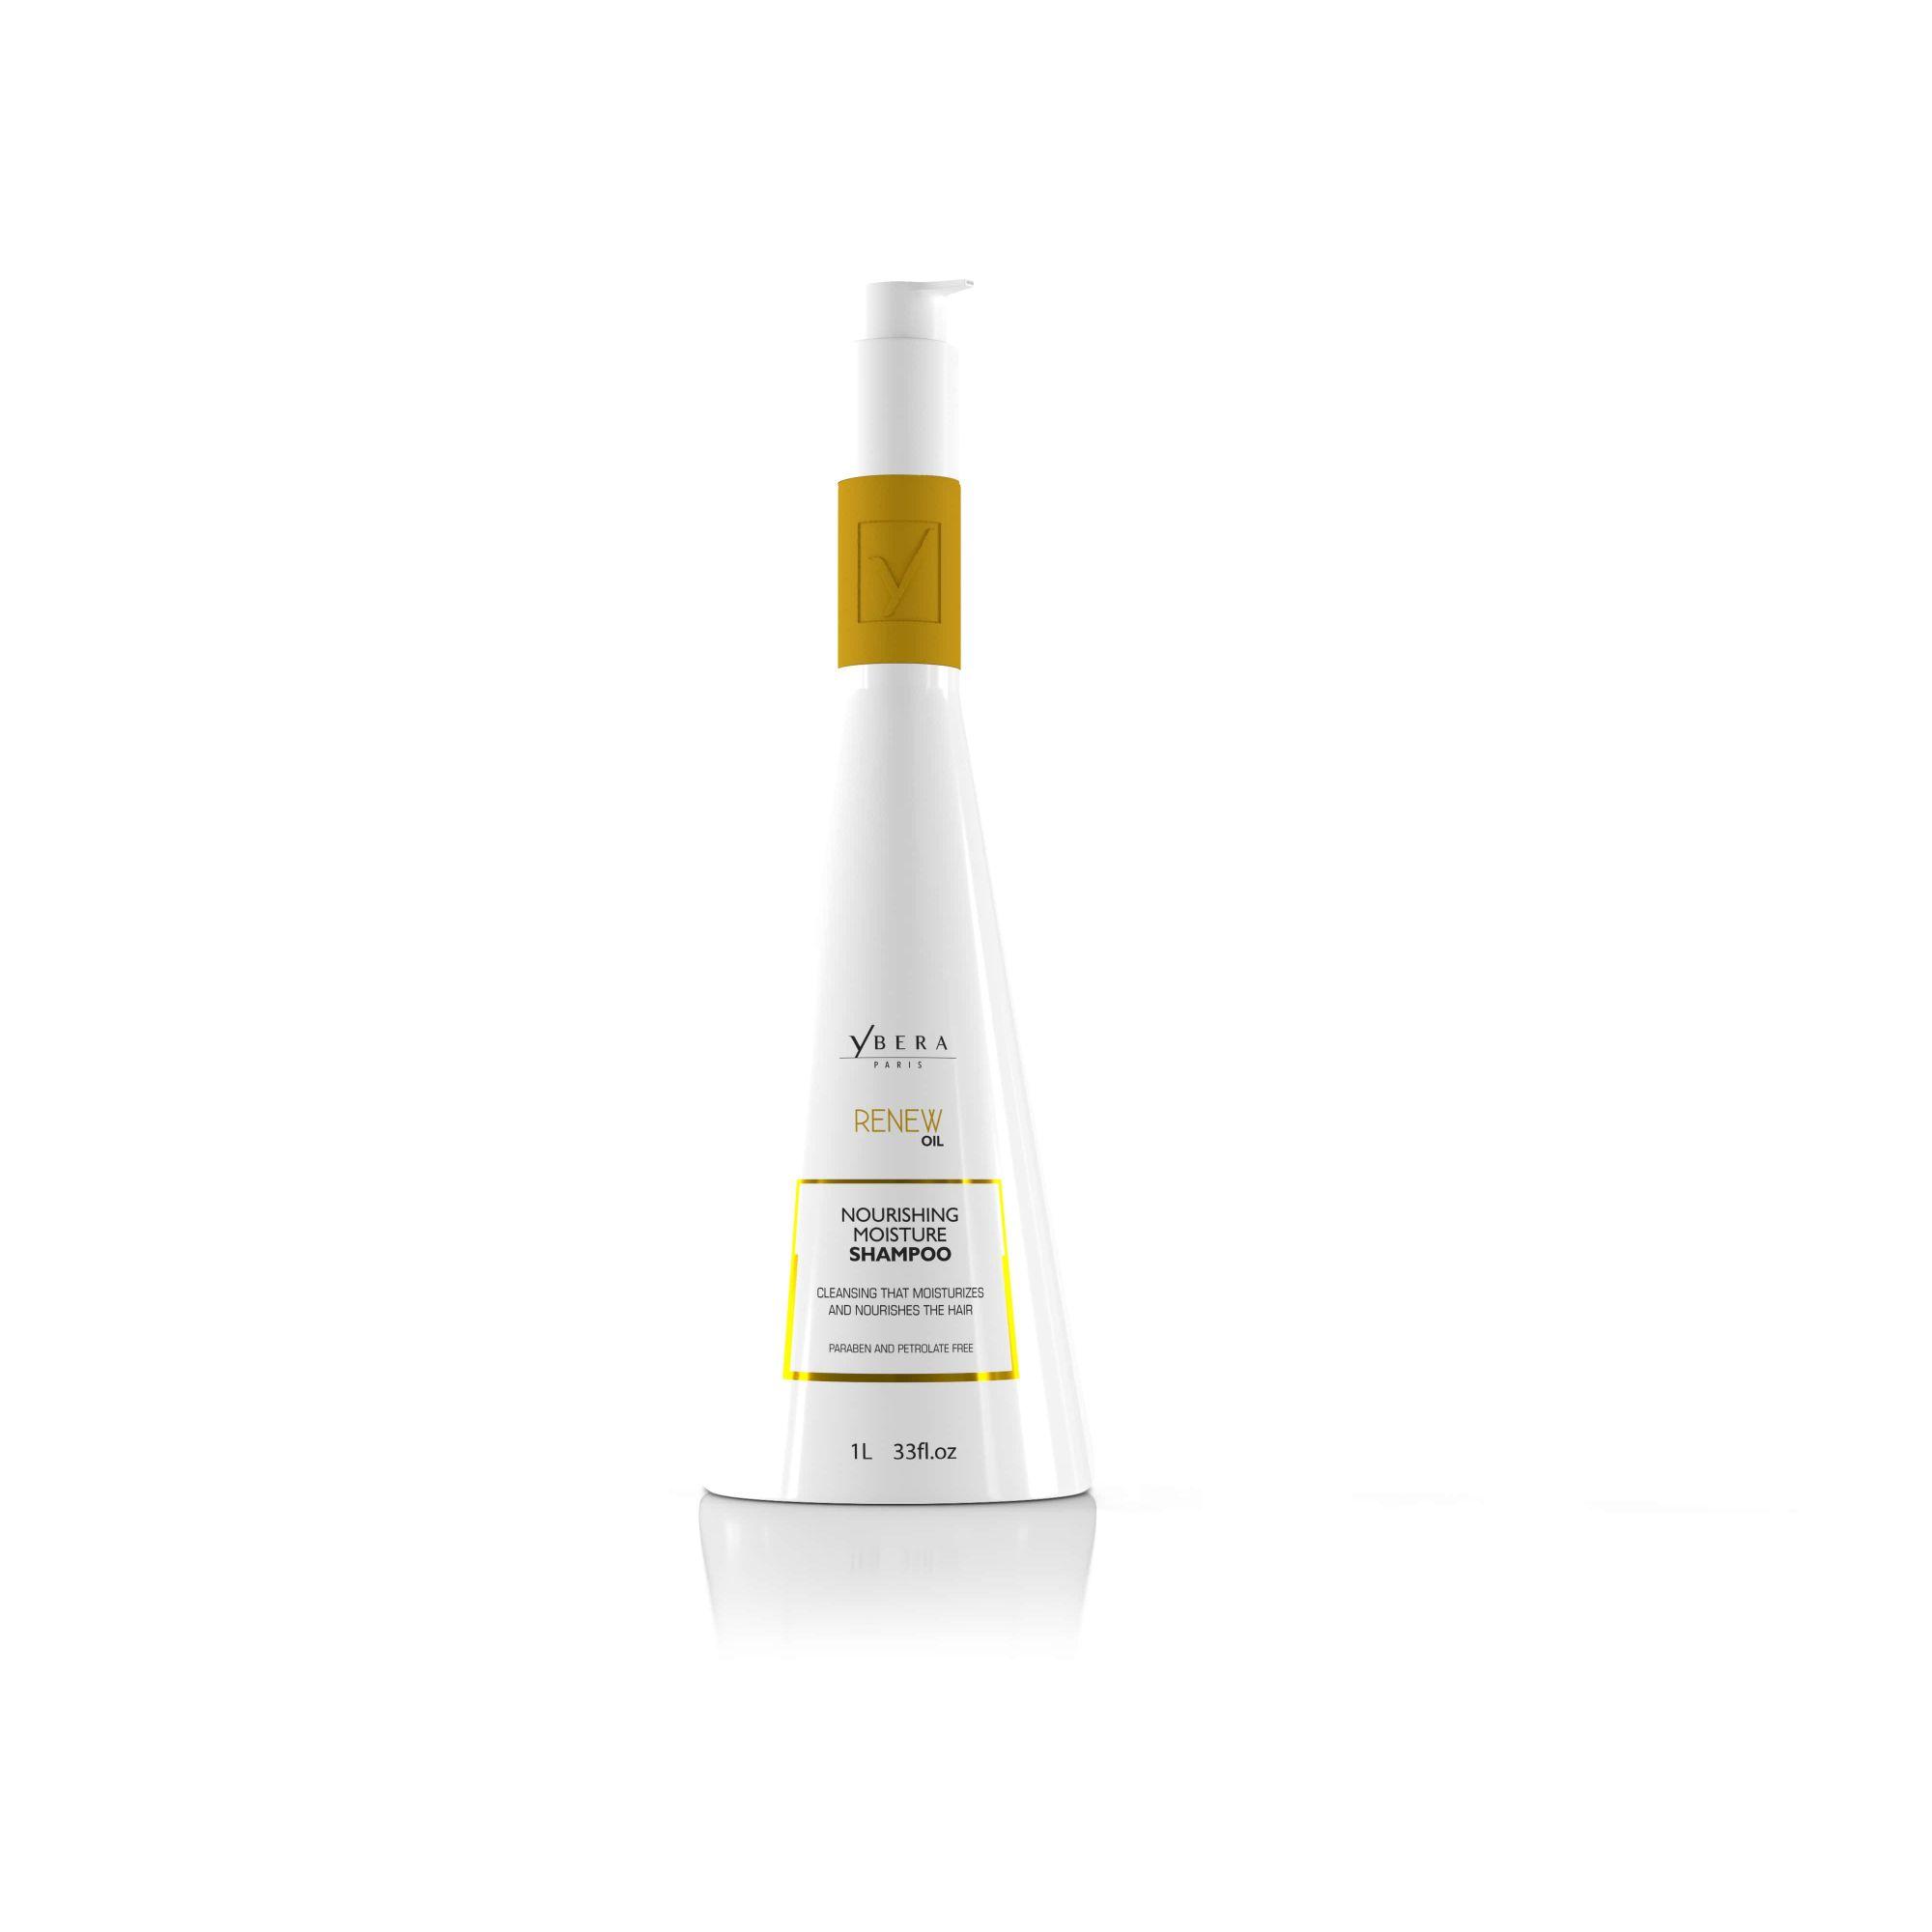 Shampoo Hidratação Nutritiva Renew Oil Ybera Paris 1l